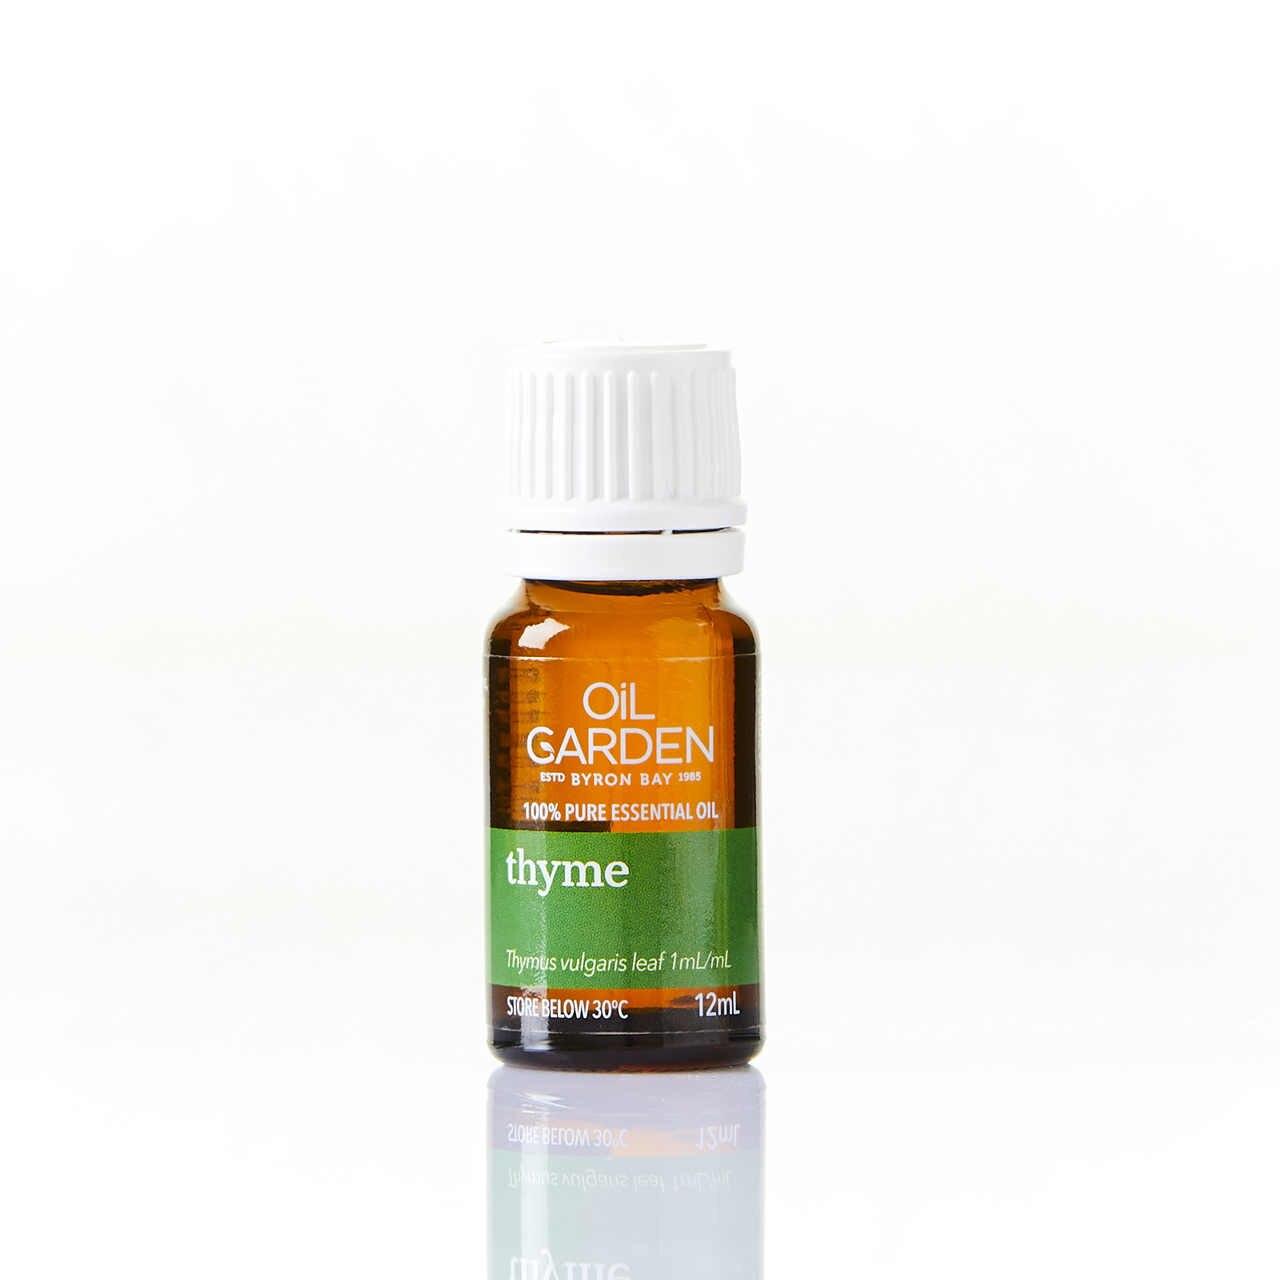 Oil Garden Thyme Pure Essential Oil 12mL 6620055